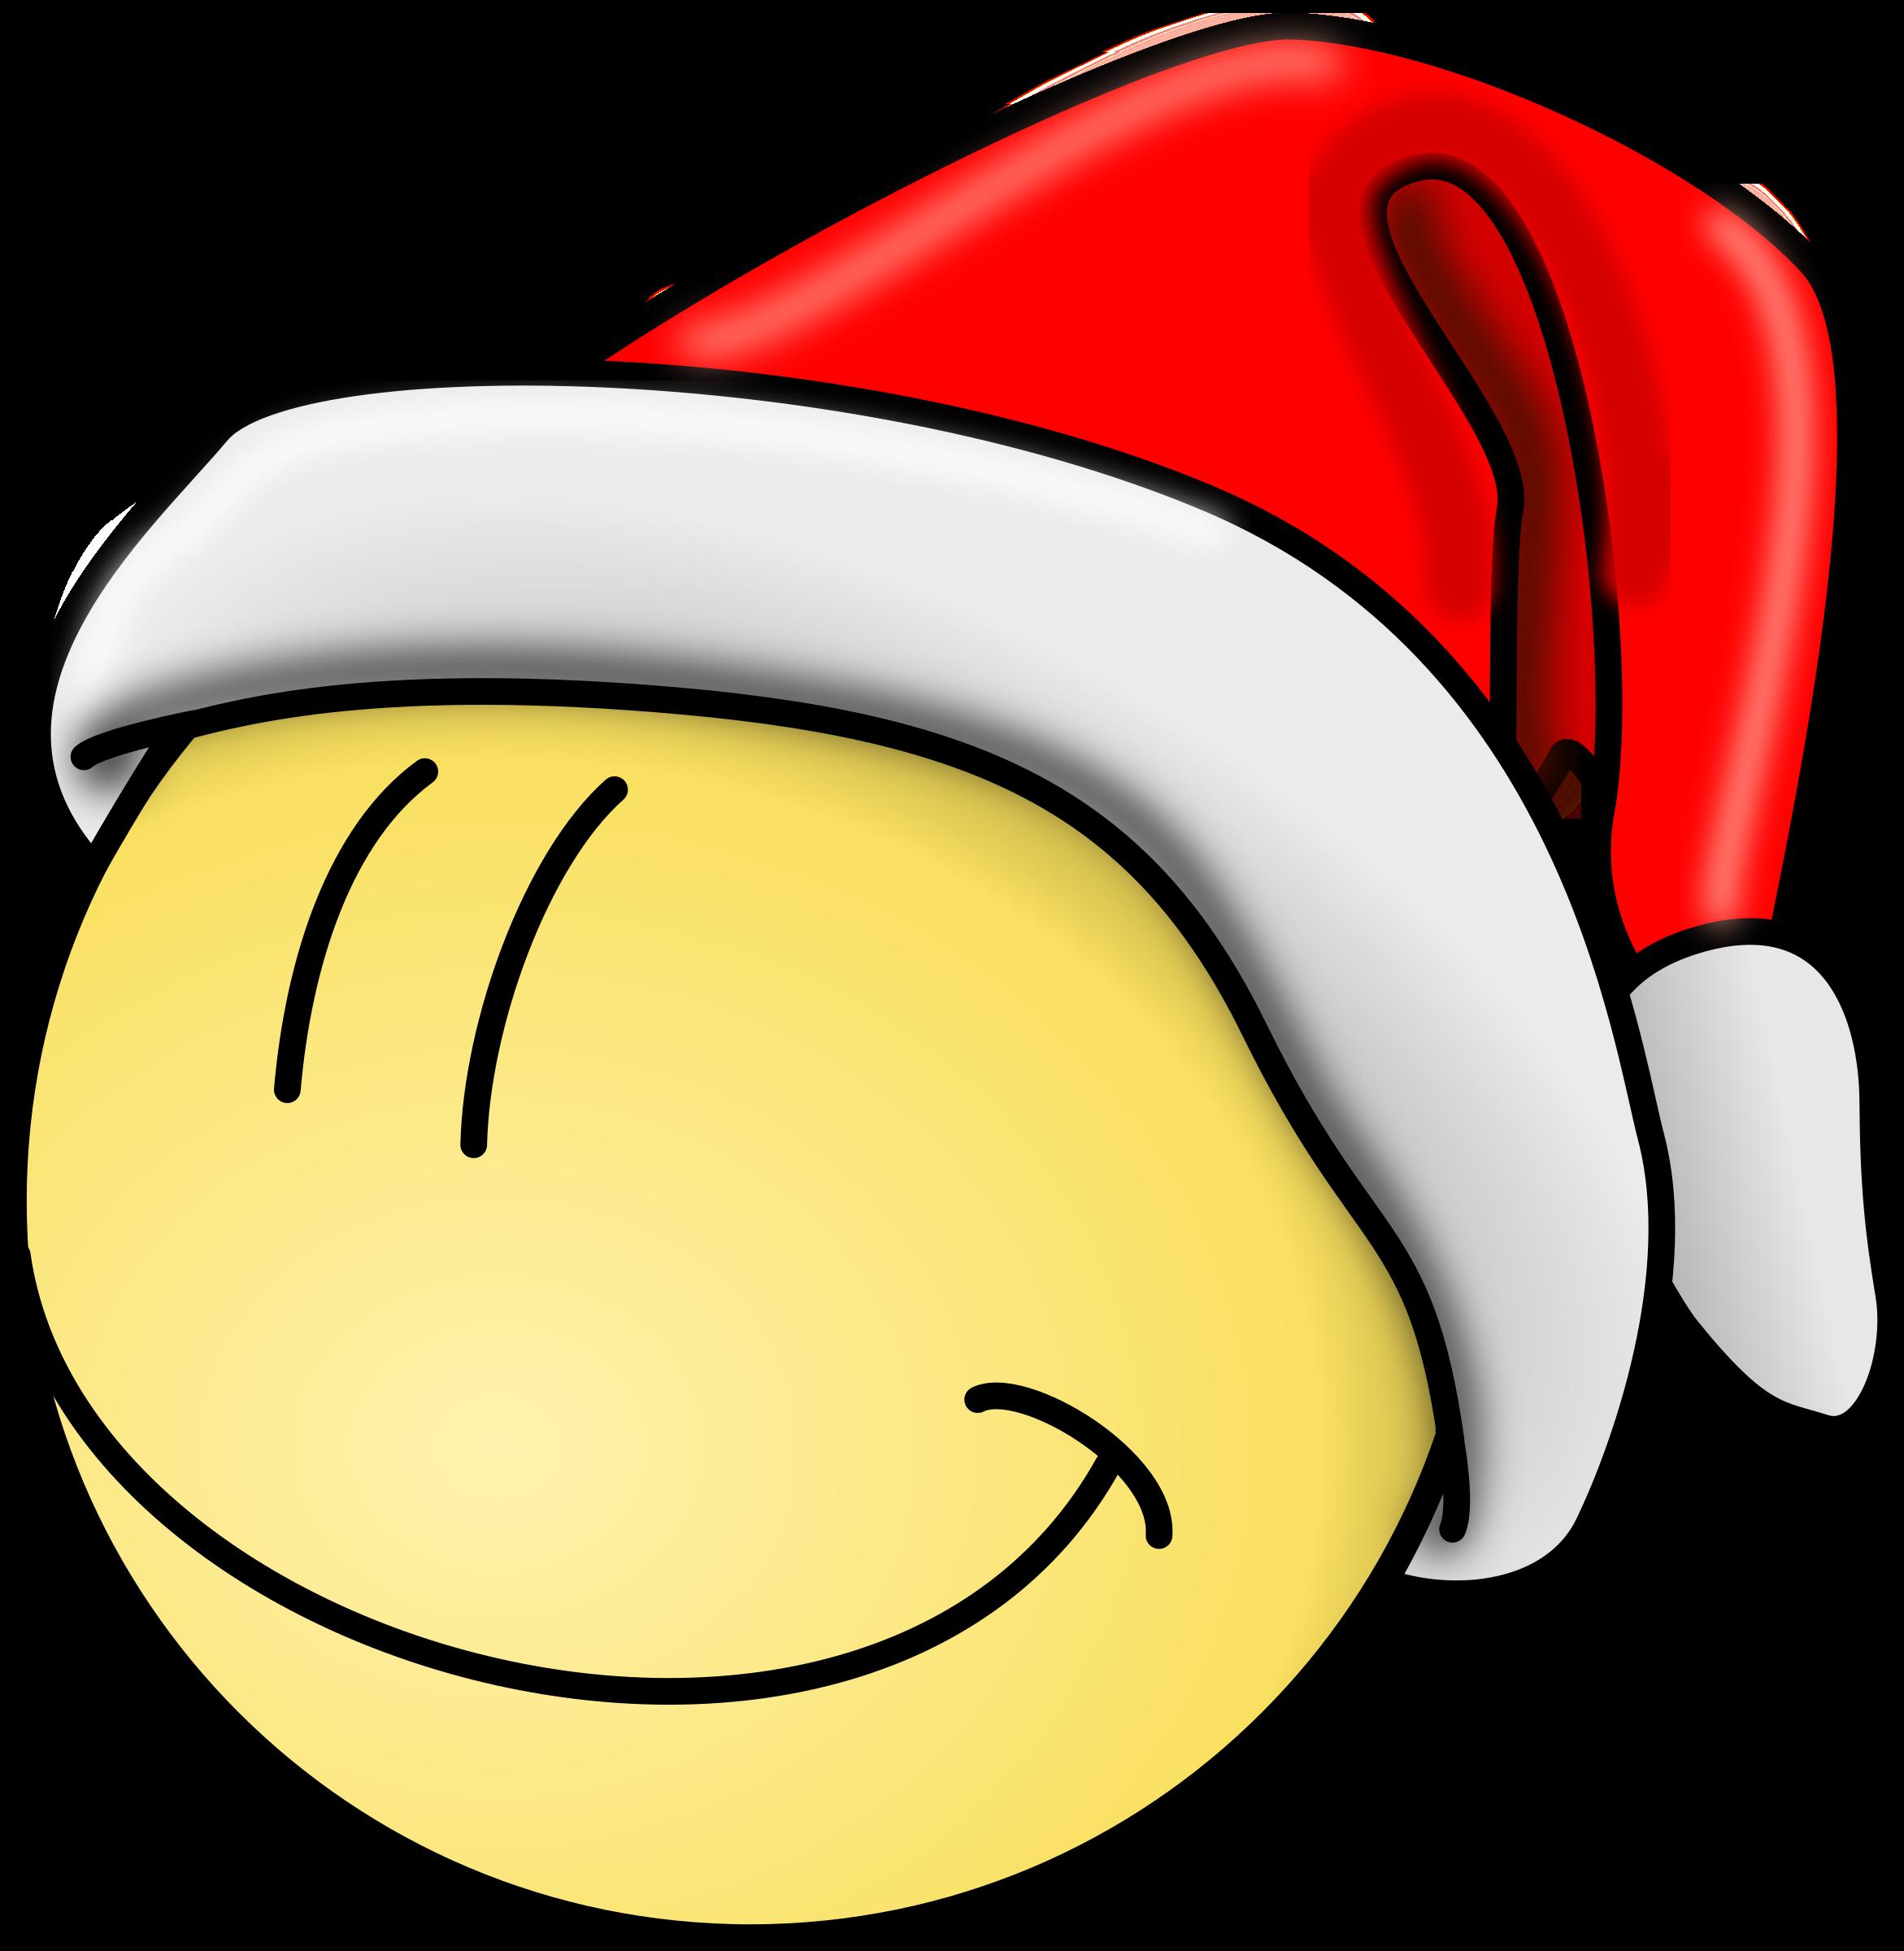 2342x2400 Santa Hat Clip Art Image Free